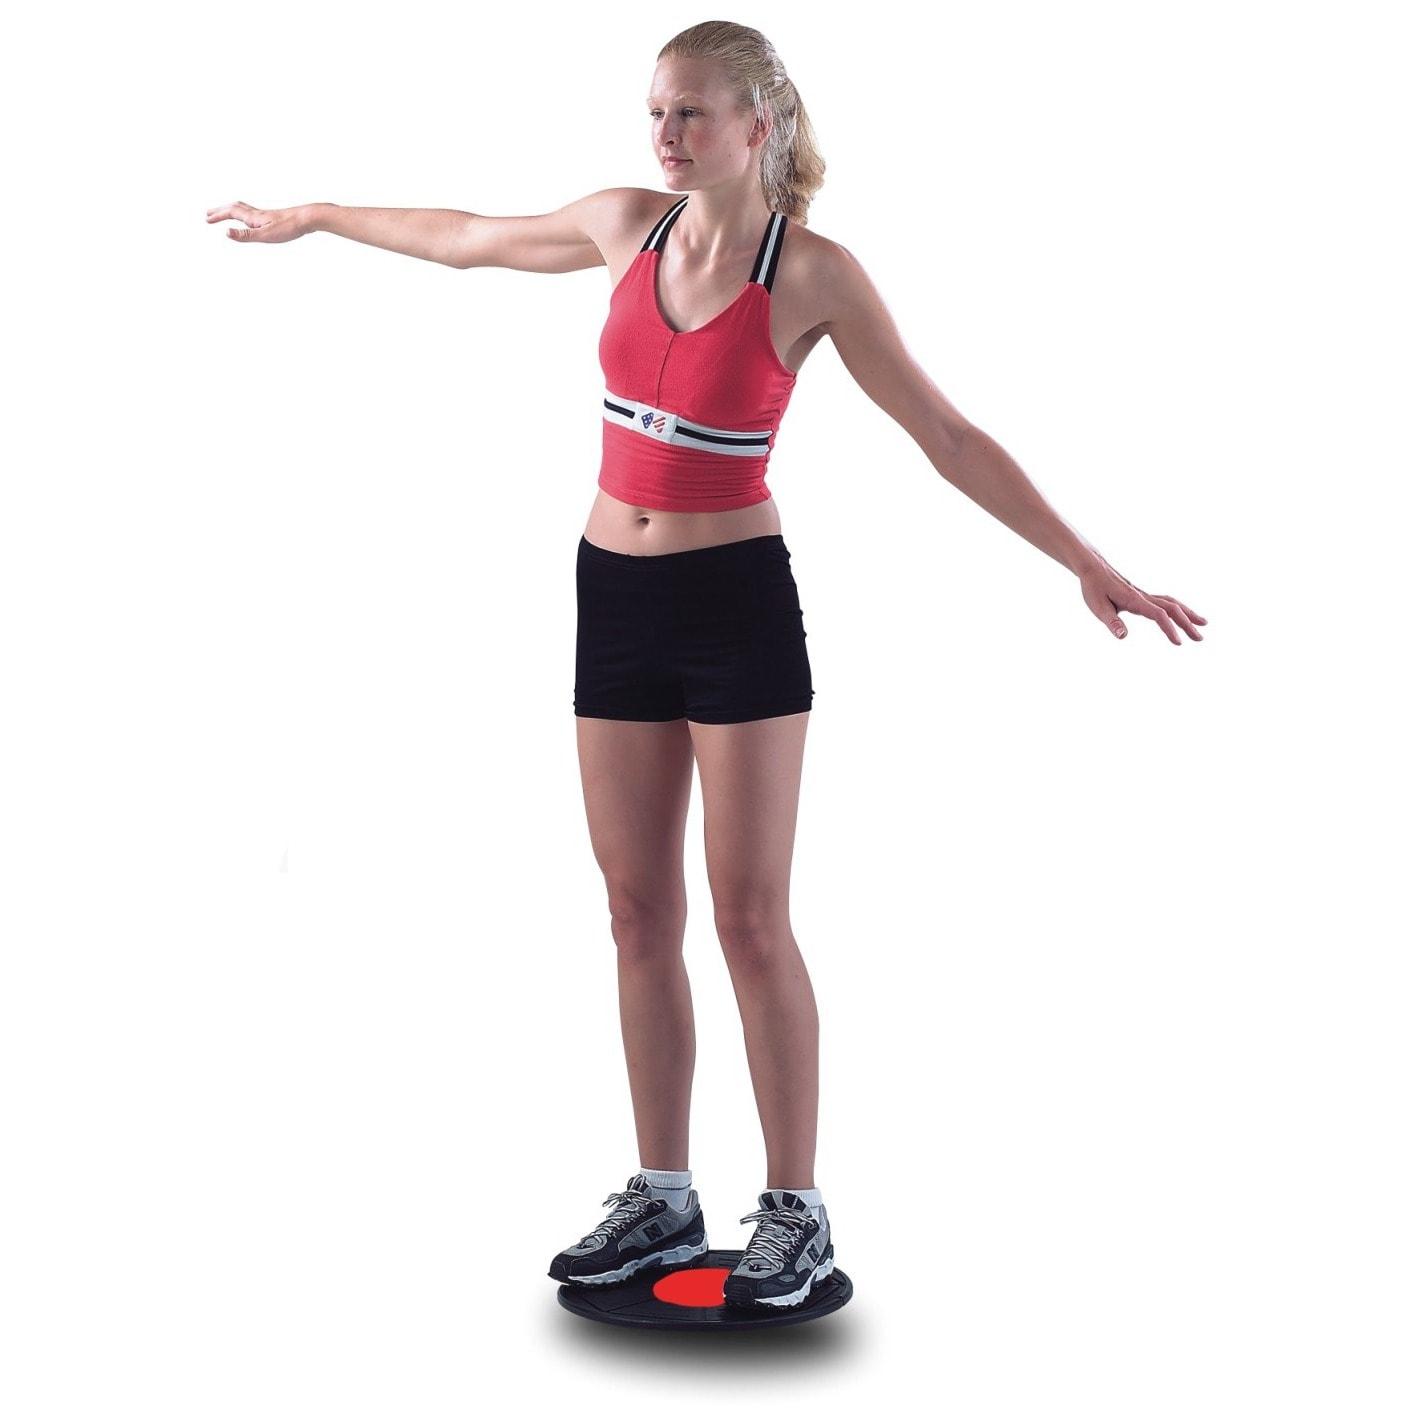 Sivan Health and Fitness 16.5-inch Balance Board at Sears.com